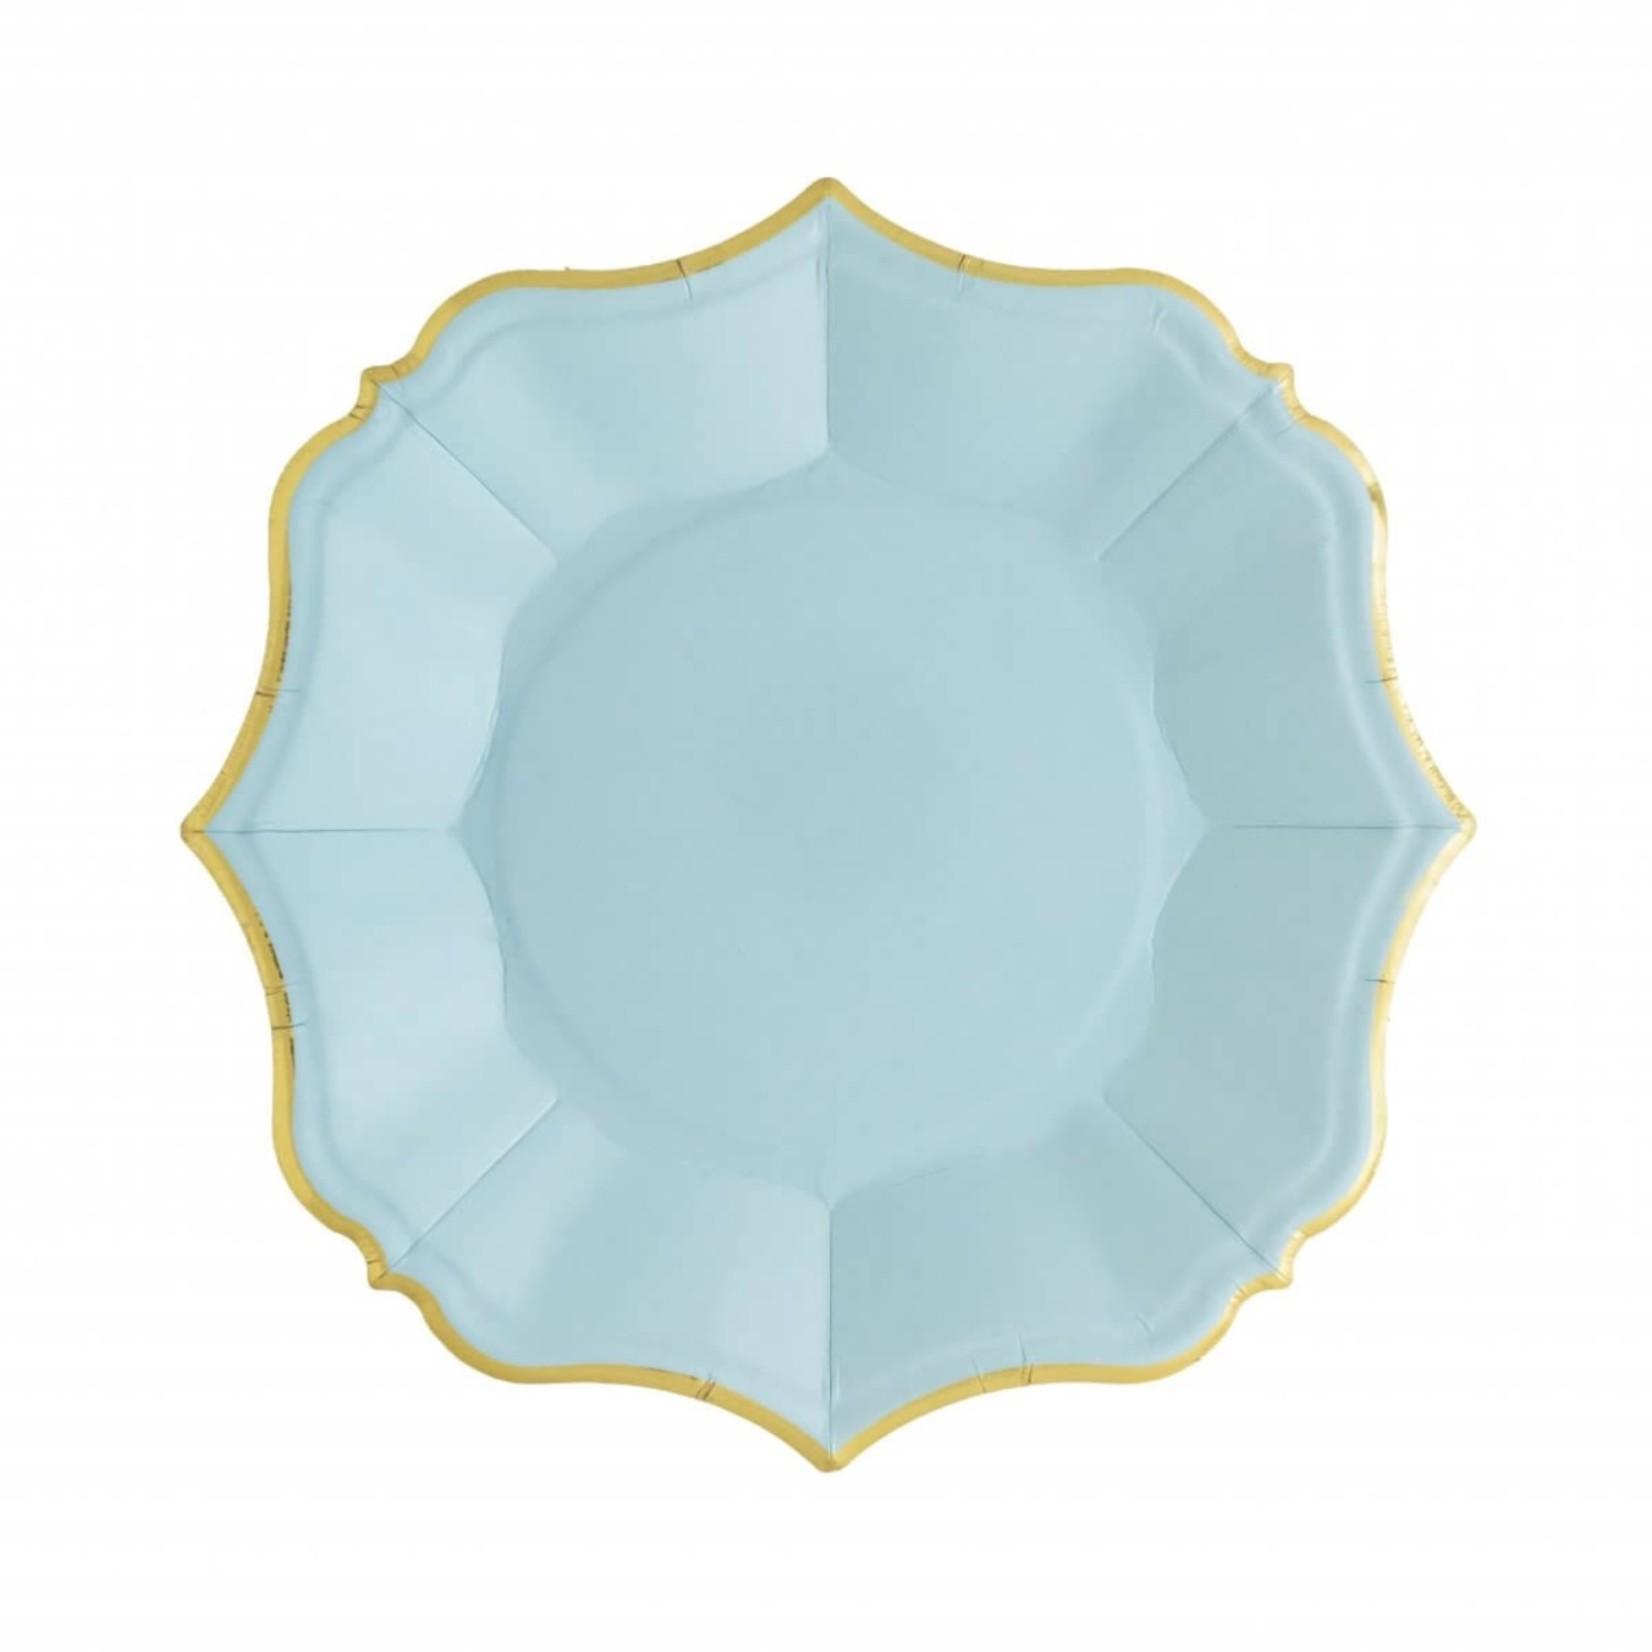 Eid Creations Marrakesh Plate